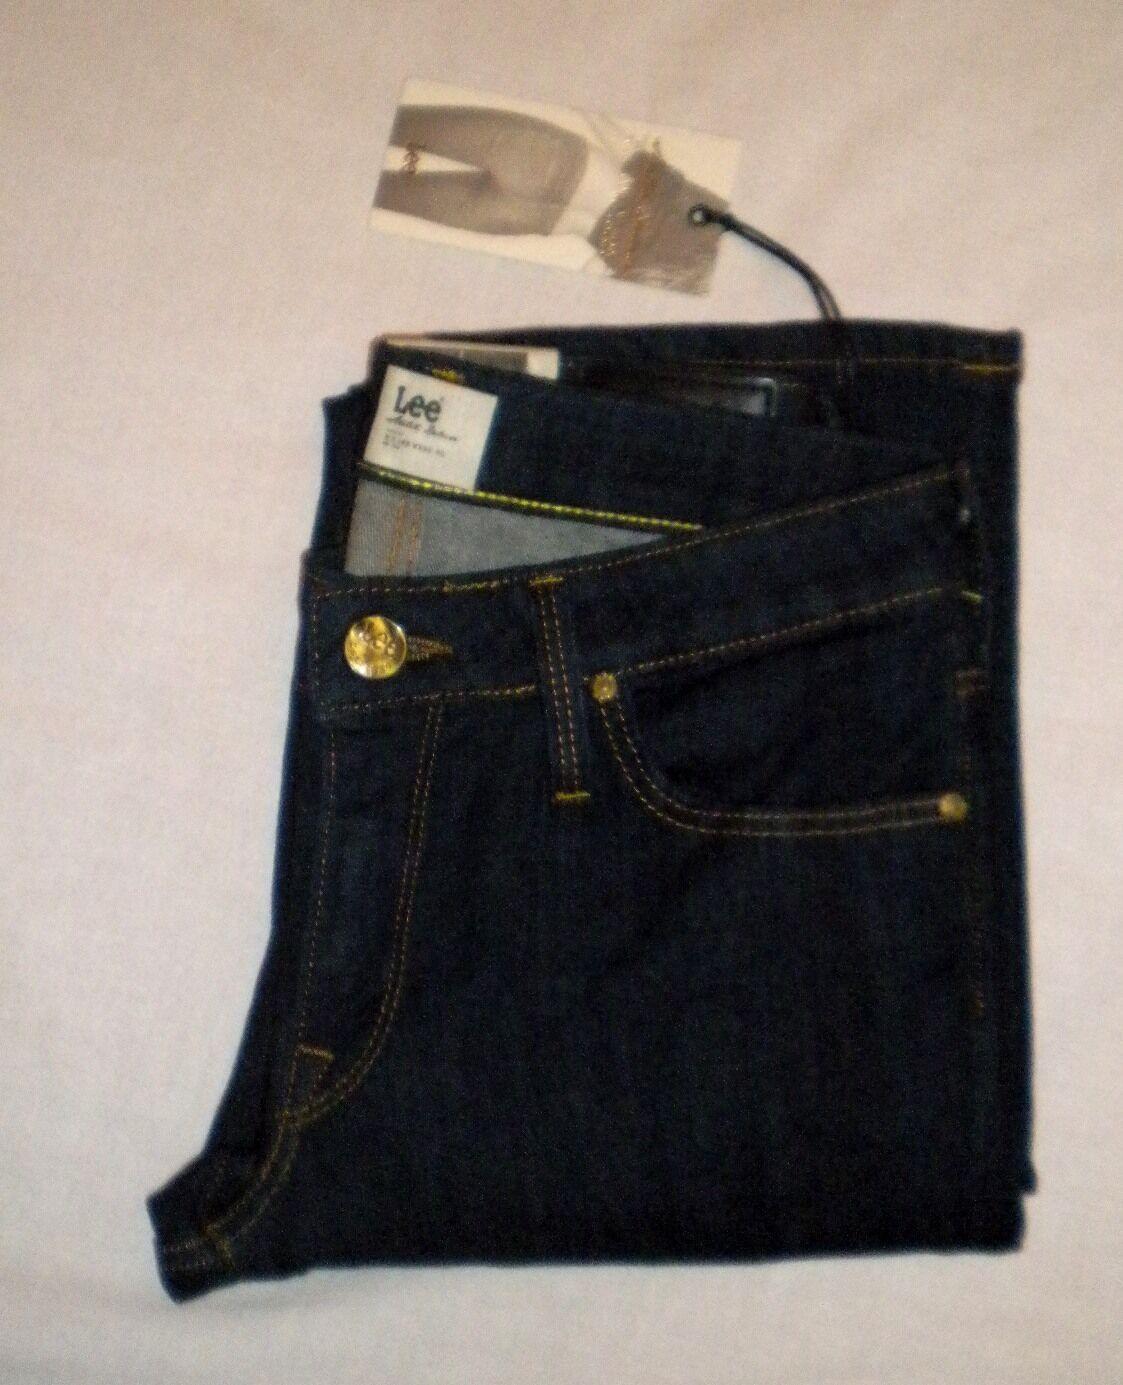 Classy Lee Women's Jeans Marlin Slim Straight Style Size W25 L33 BNWT